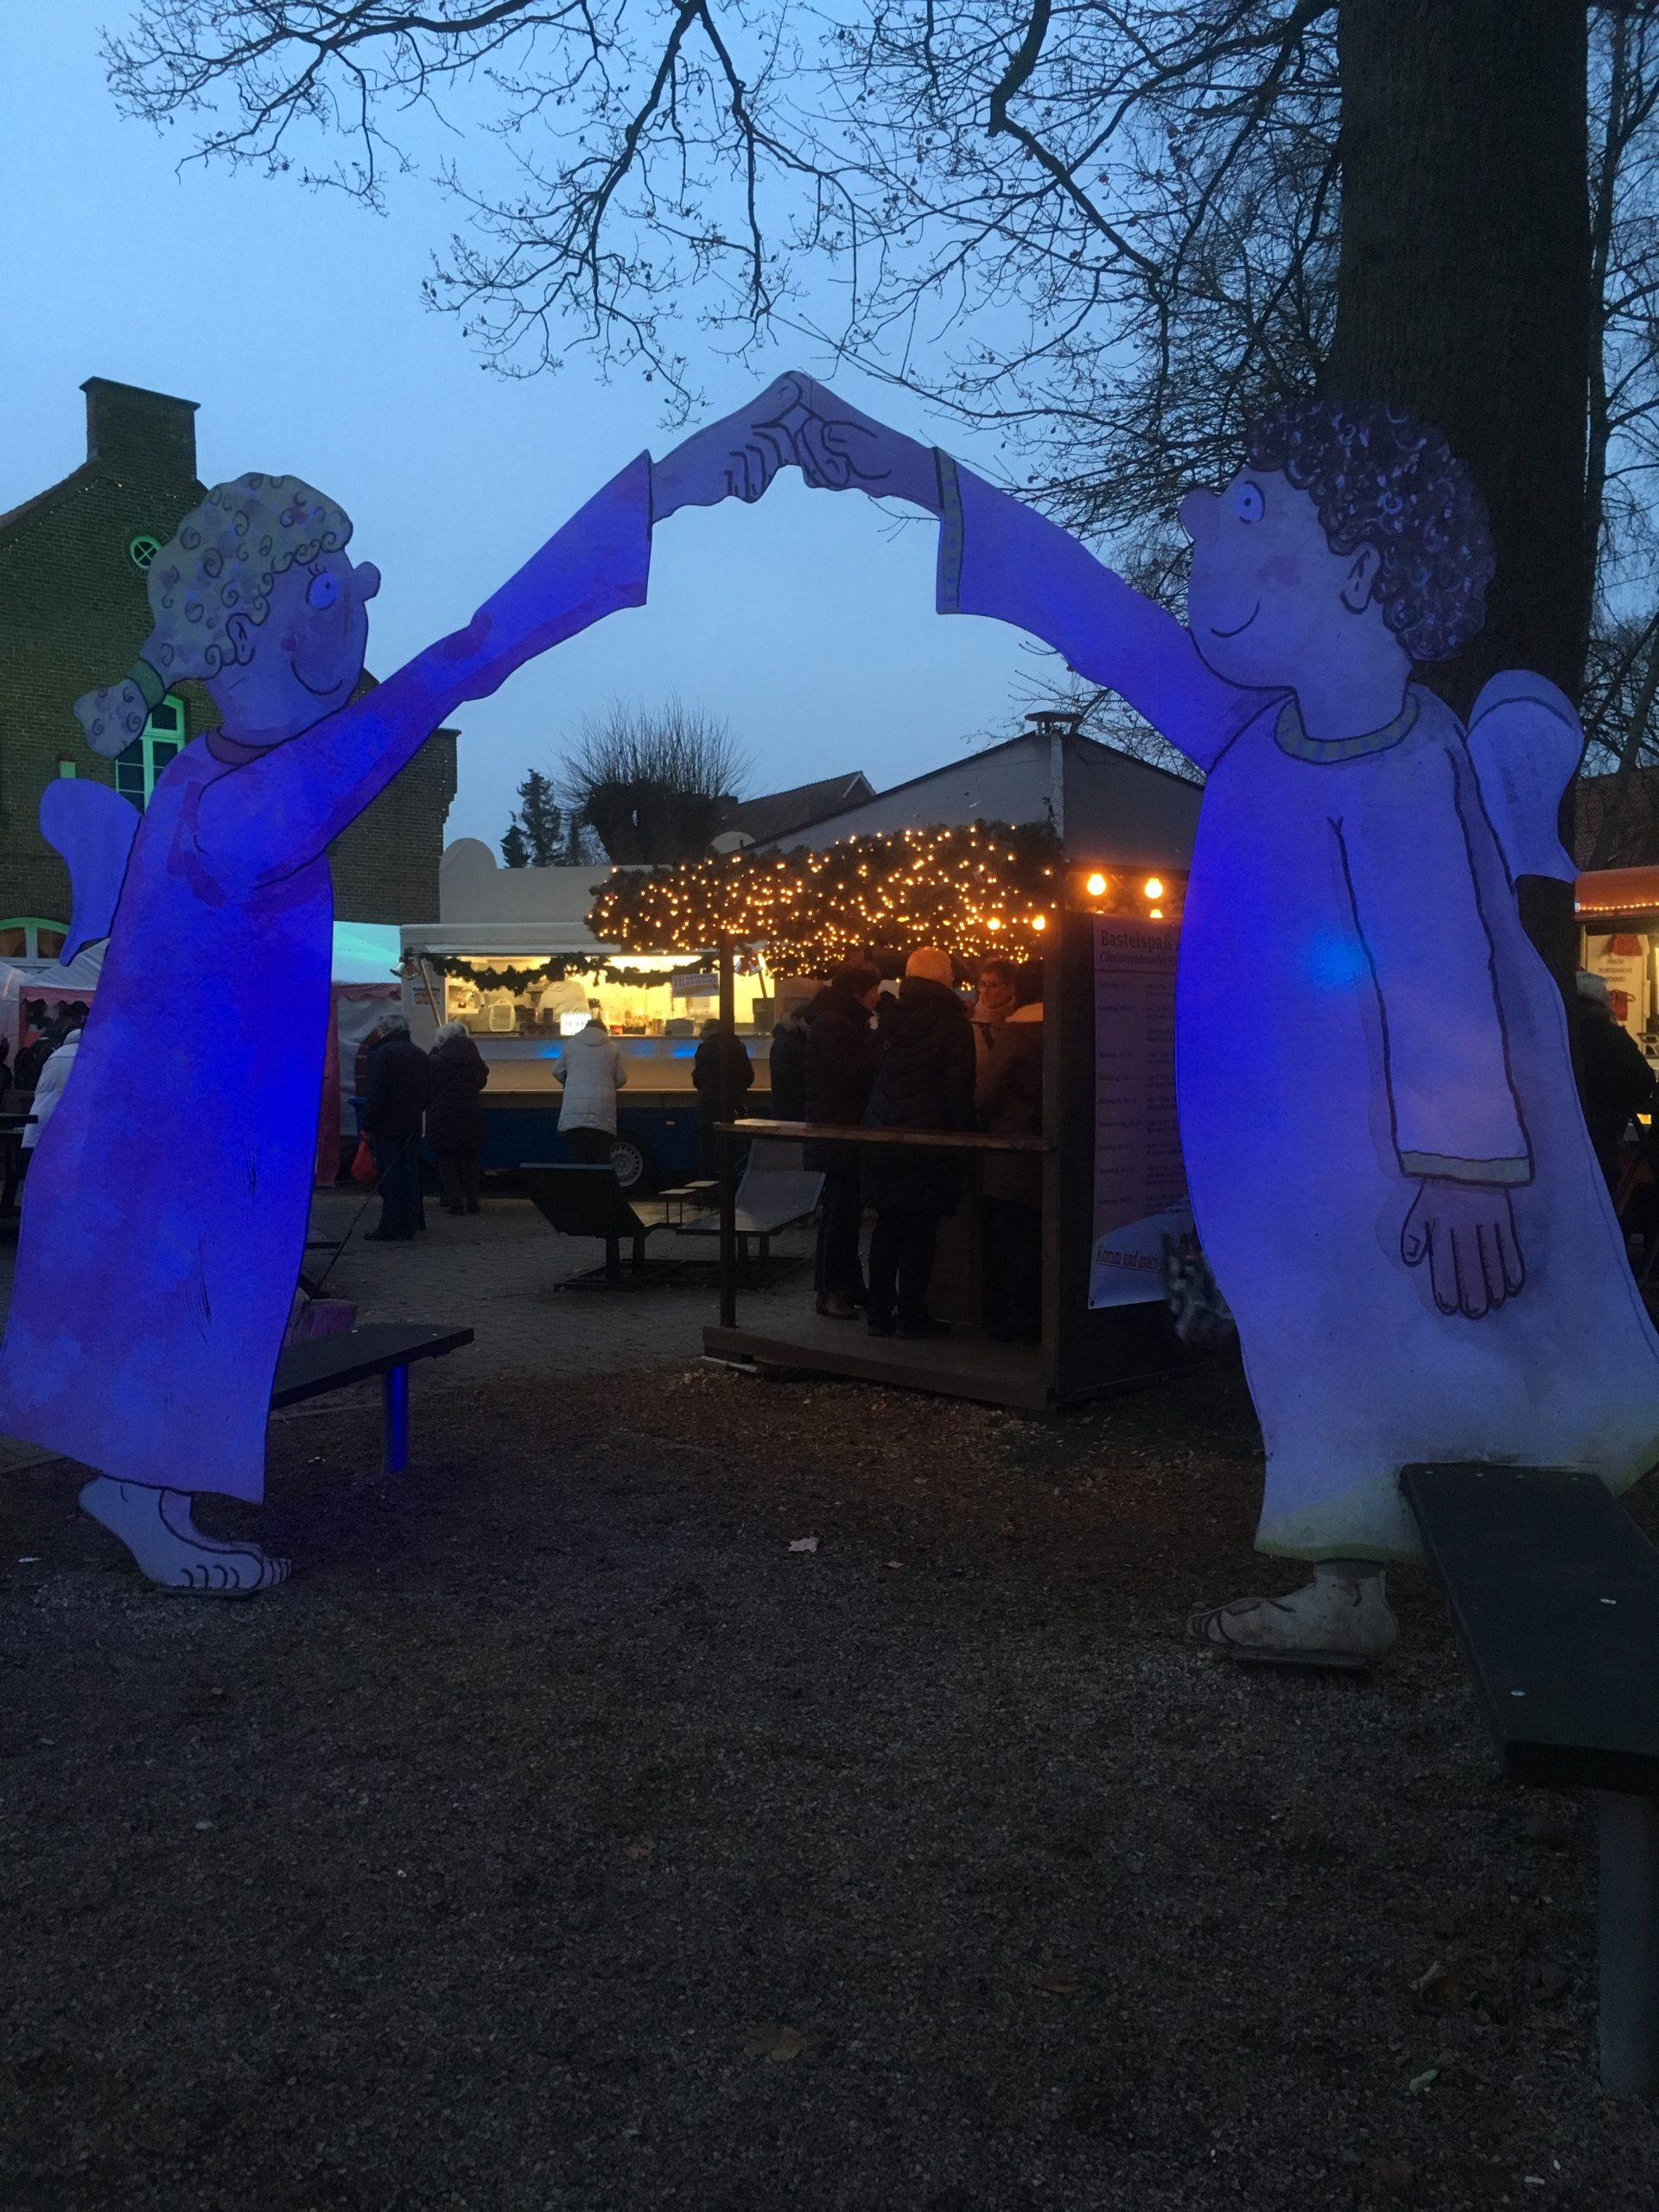 Besuch des Christkindmarkts in Himmelpforten